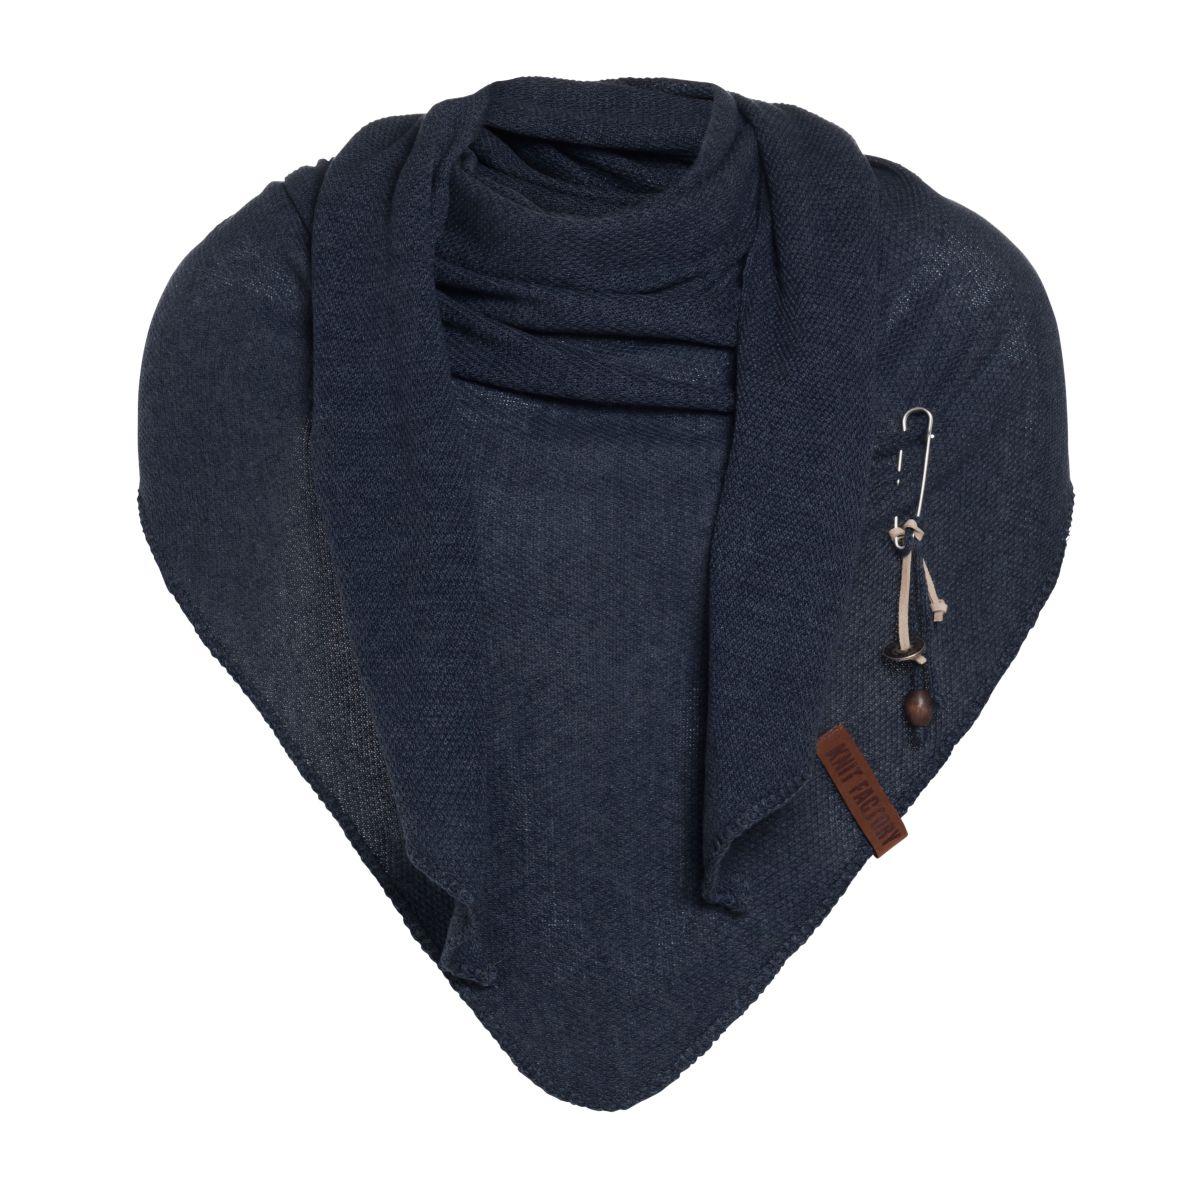 knit factory 1306026 lola omslagdoek navy1